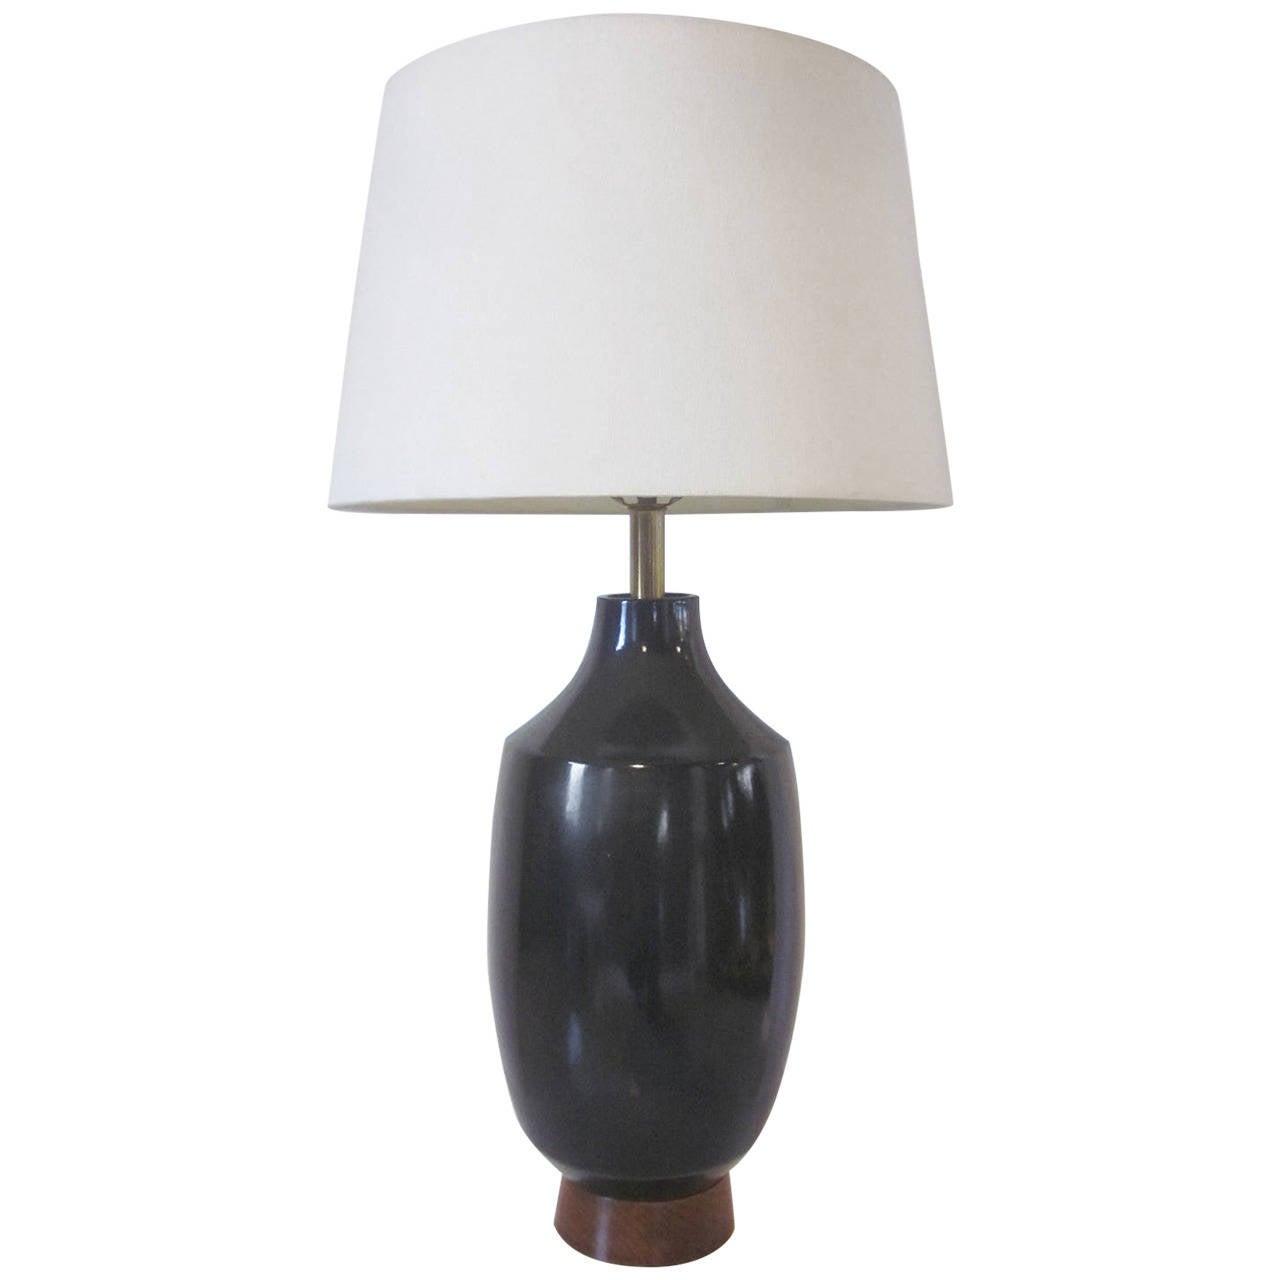 Martz Styled Mid-Century Table Lamp